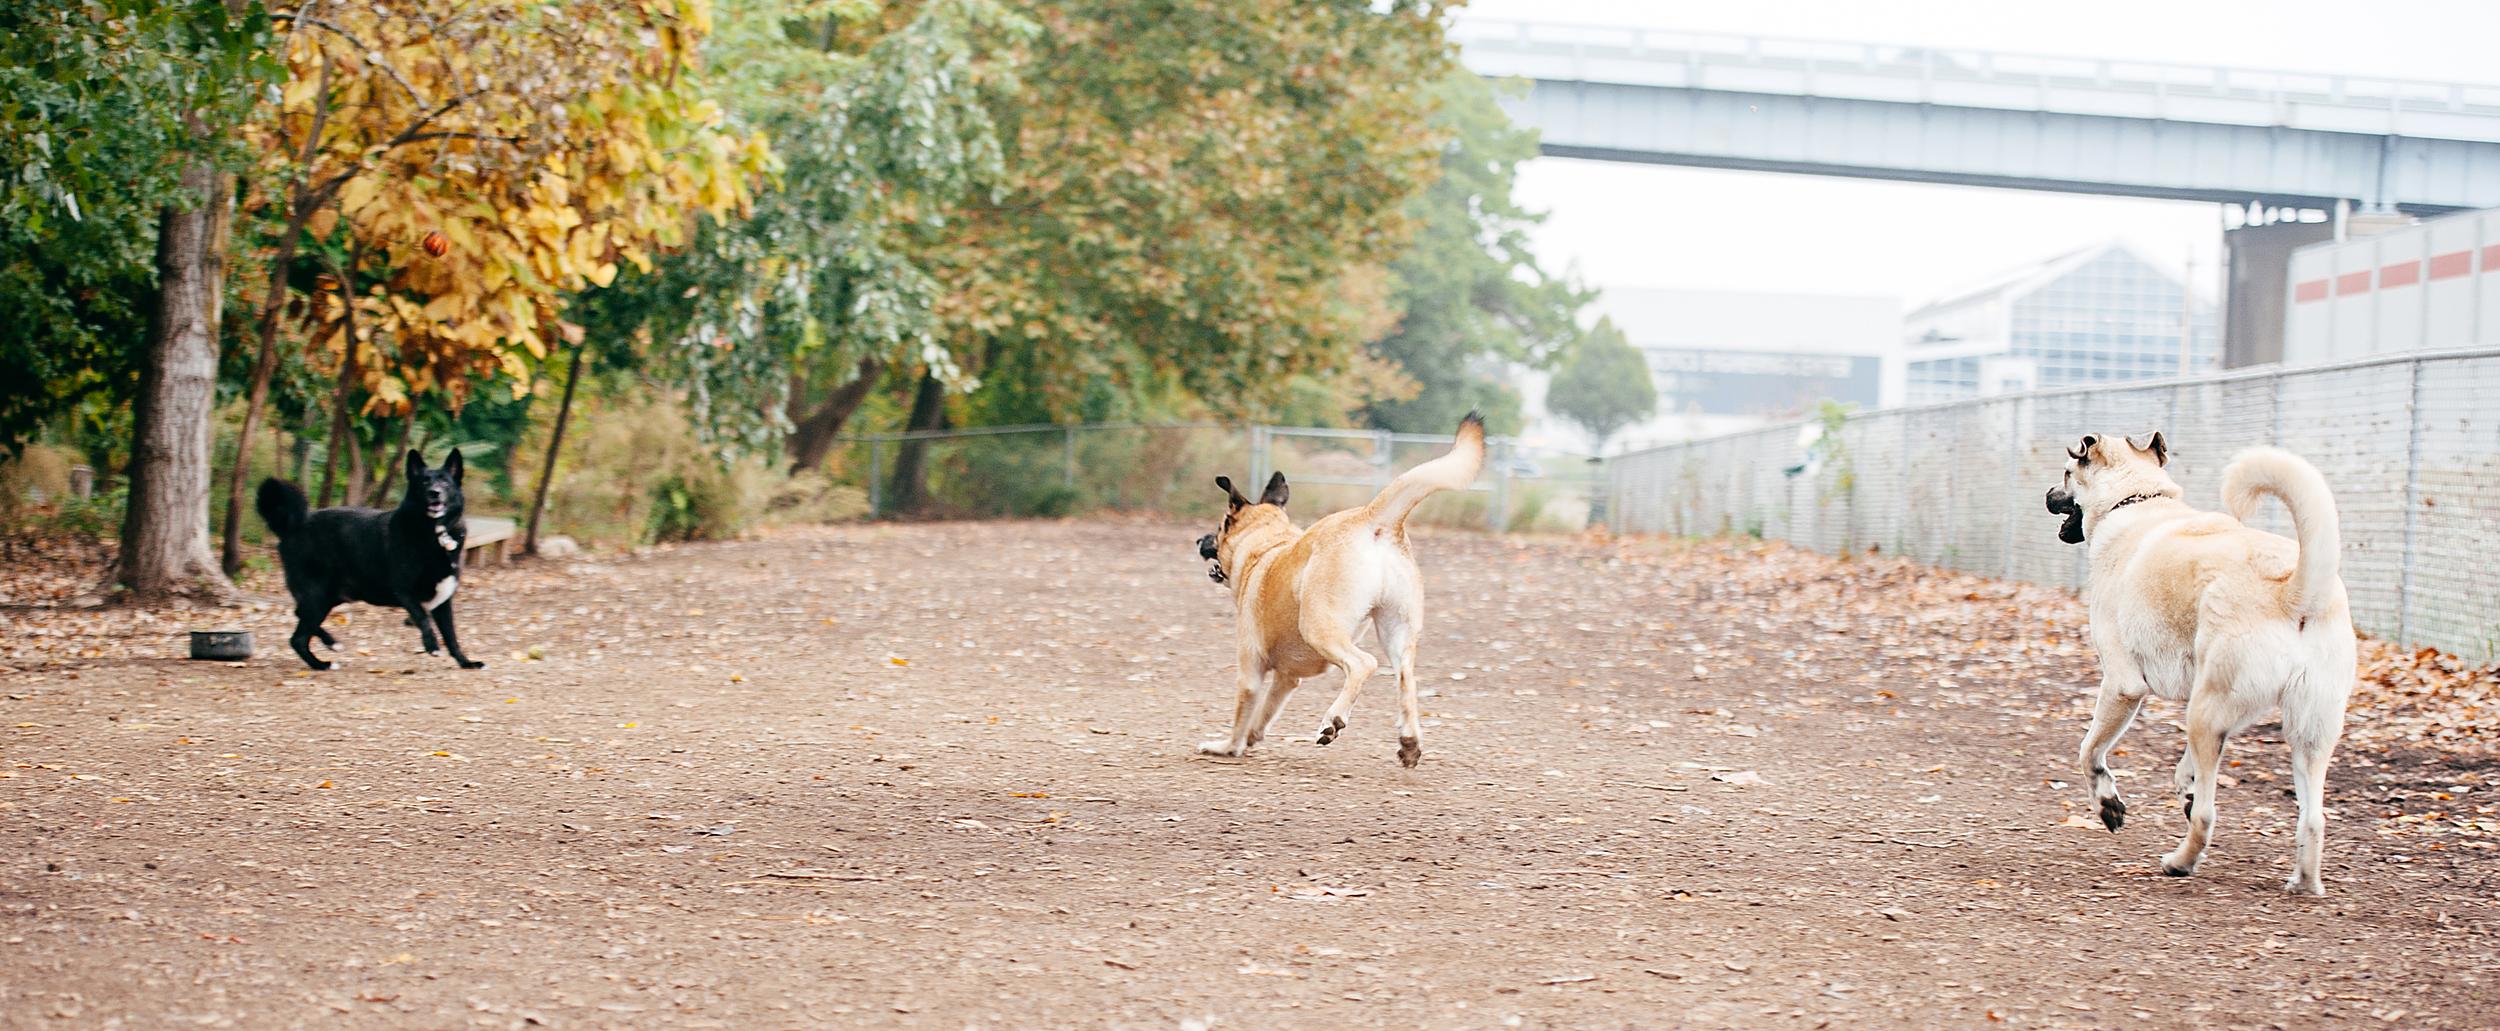 bernard-dog-run-pittsburgh-walsh03.jpg